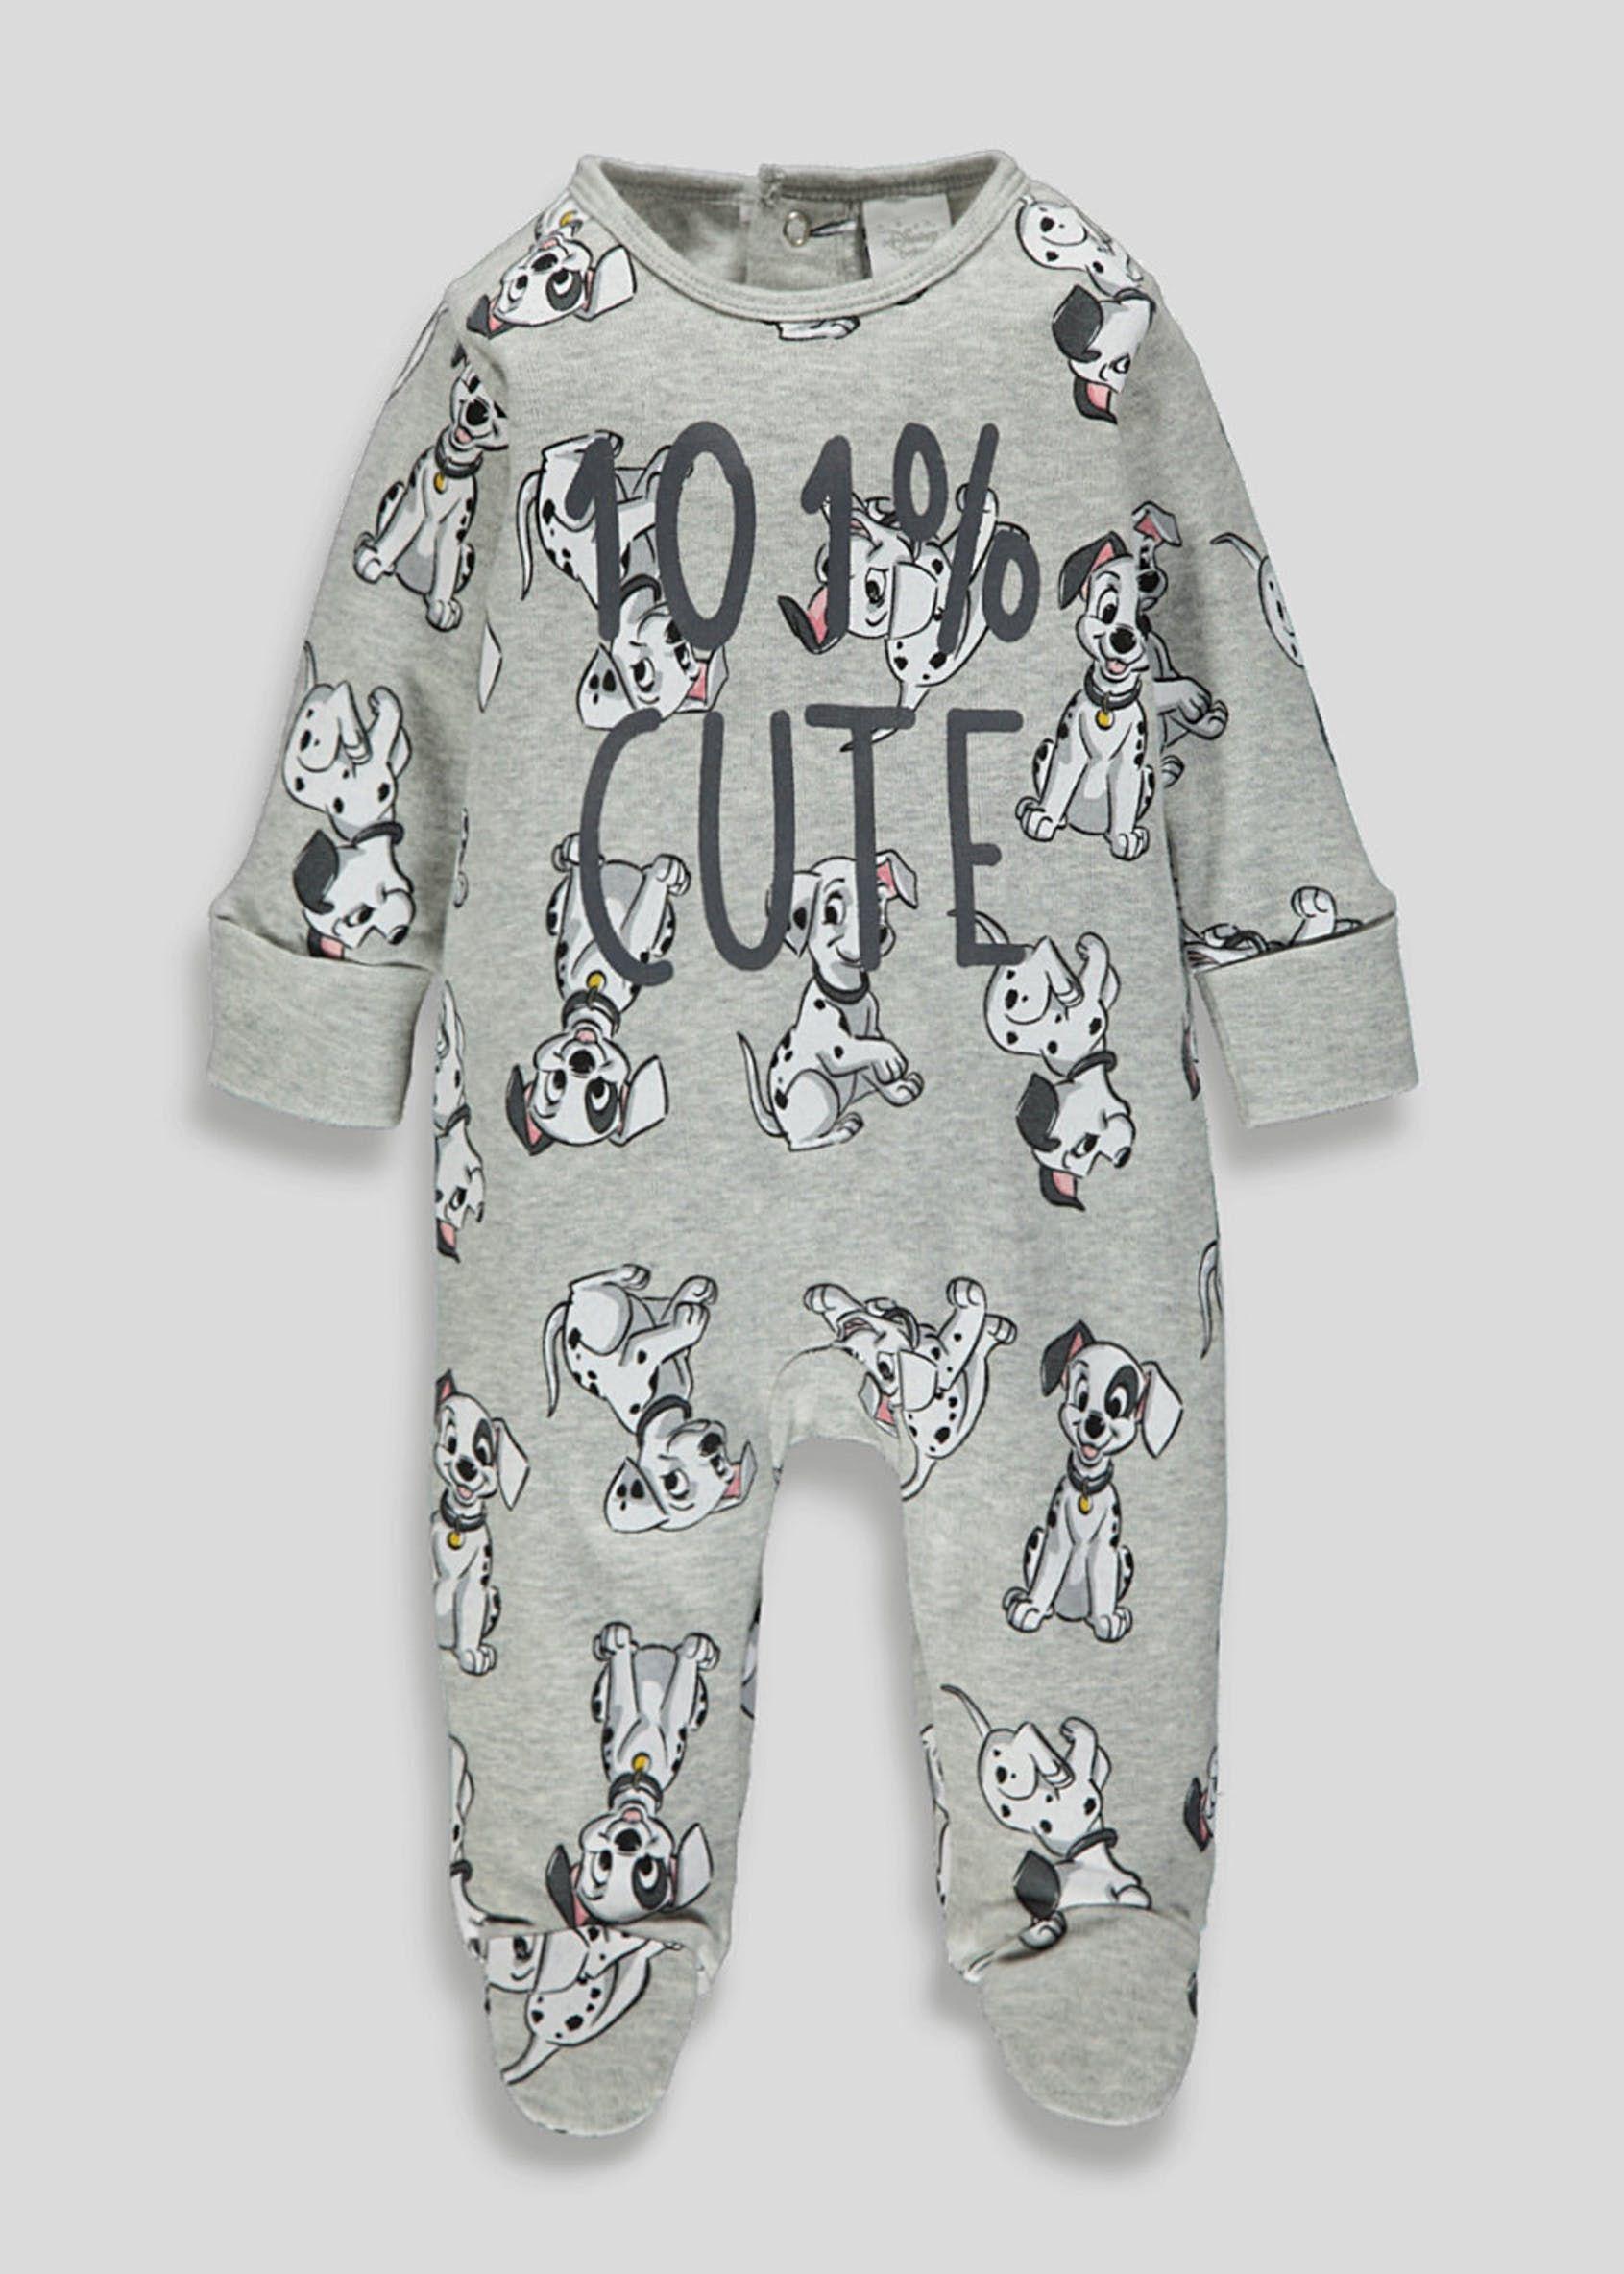 Unisex Disney 101 Dalmatians Baby Grow Newborn 12mths Grey Disney Baby Clothes Baby Boy Disney Baby Outfits Newborn